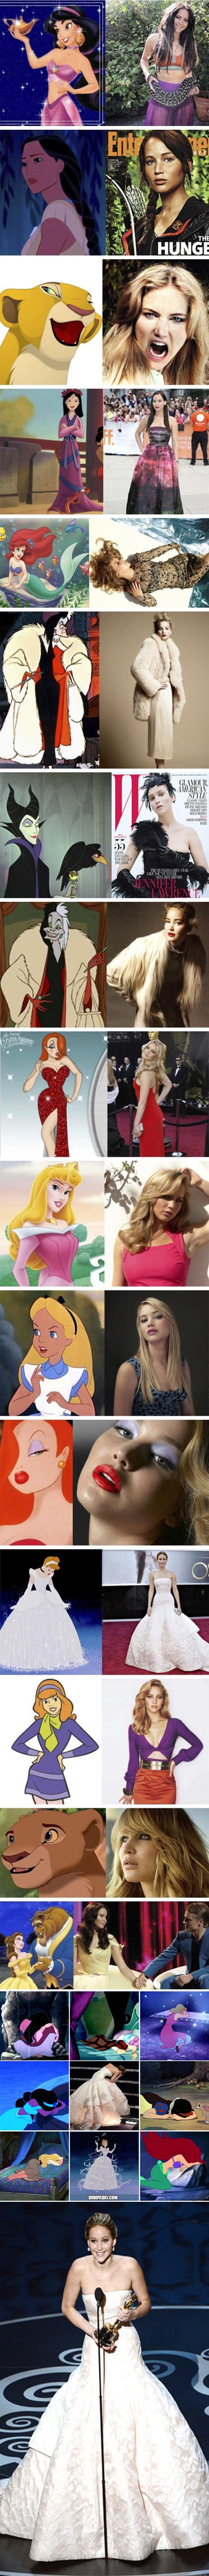 Jenifer lawerence is the disney princesses